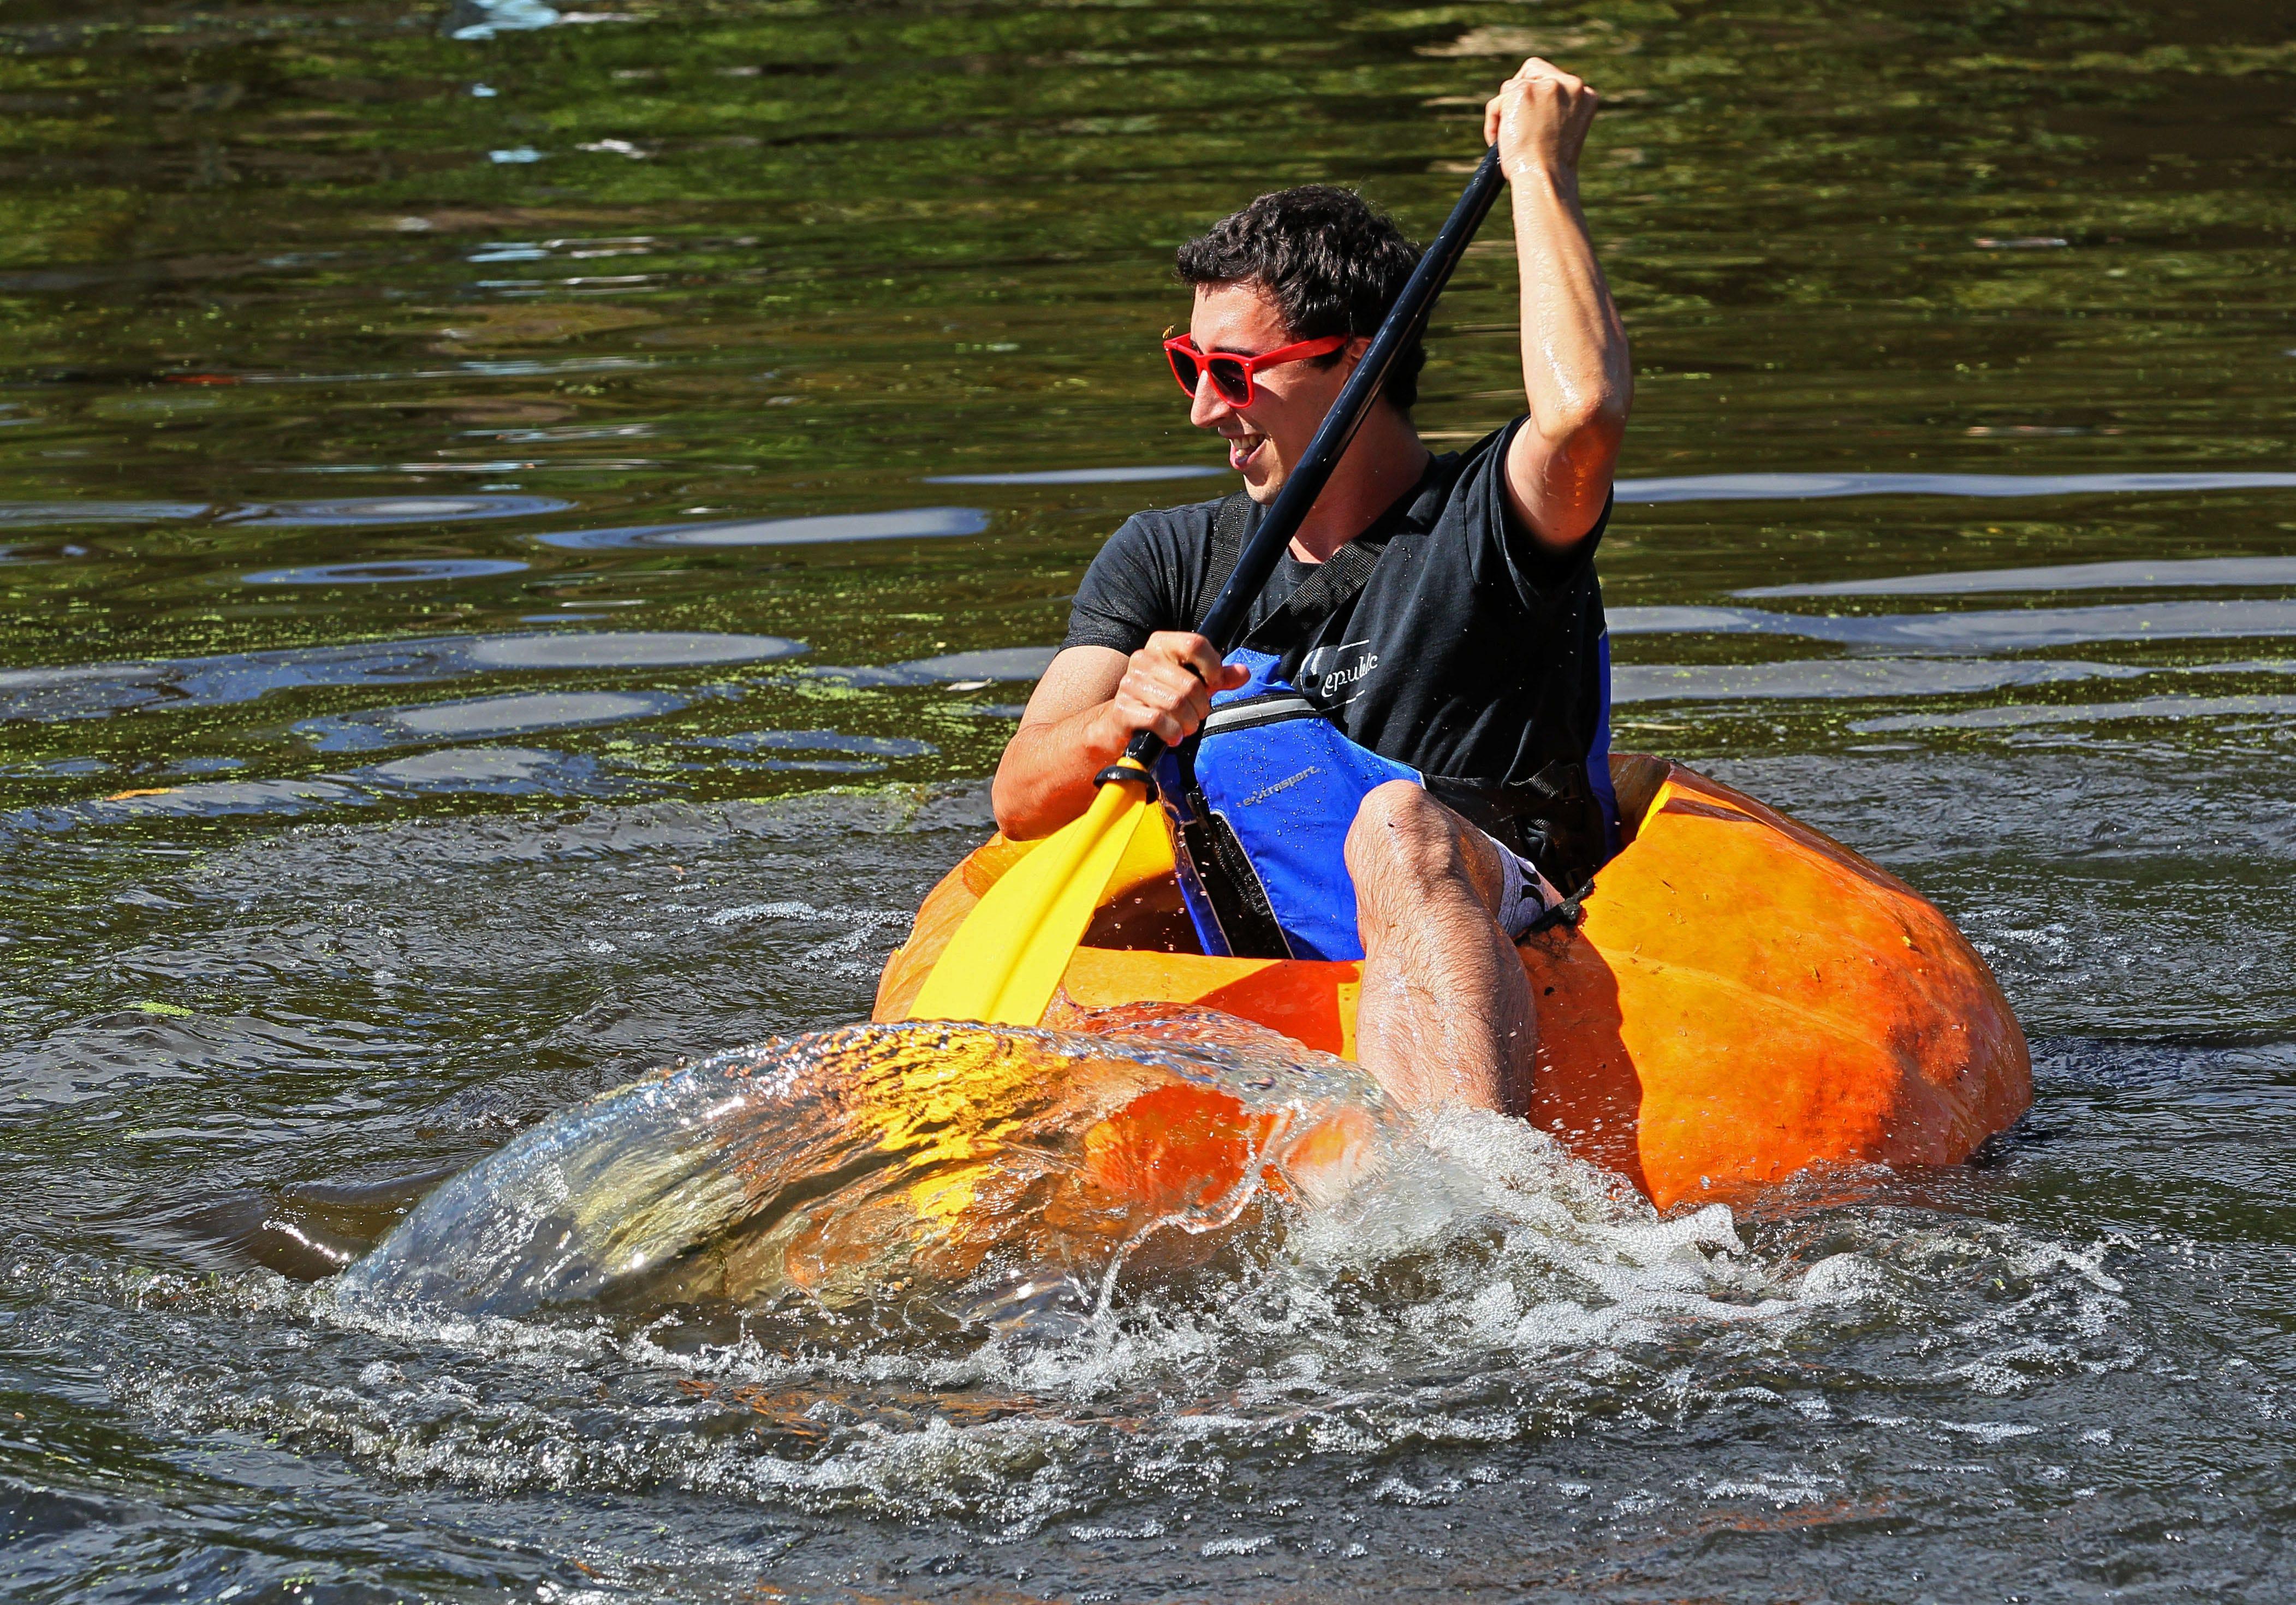 The Pumpkin Regatta sets sail this weekend during the Cedarburg Wine & Harvest Festival.